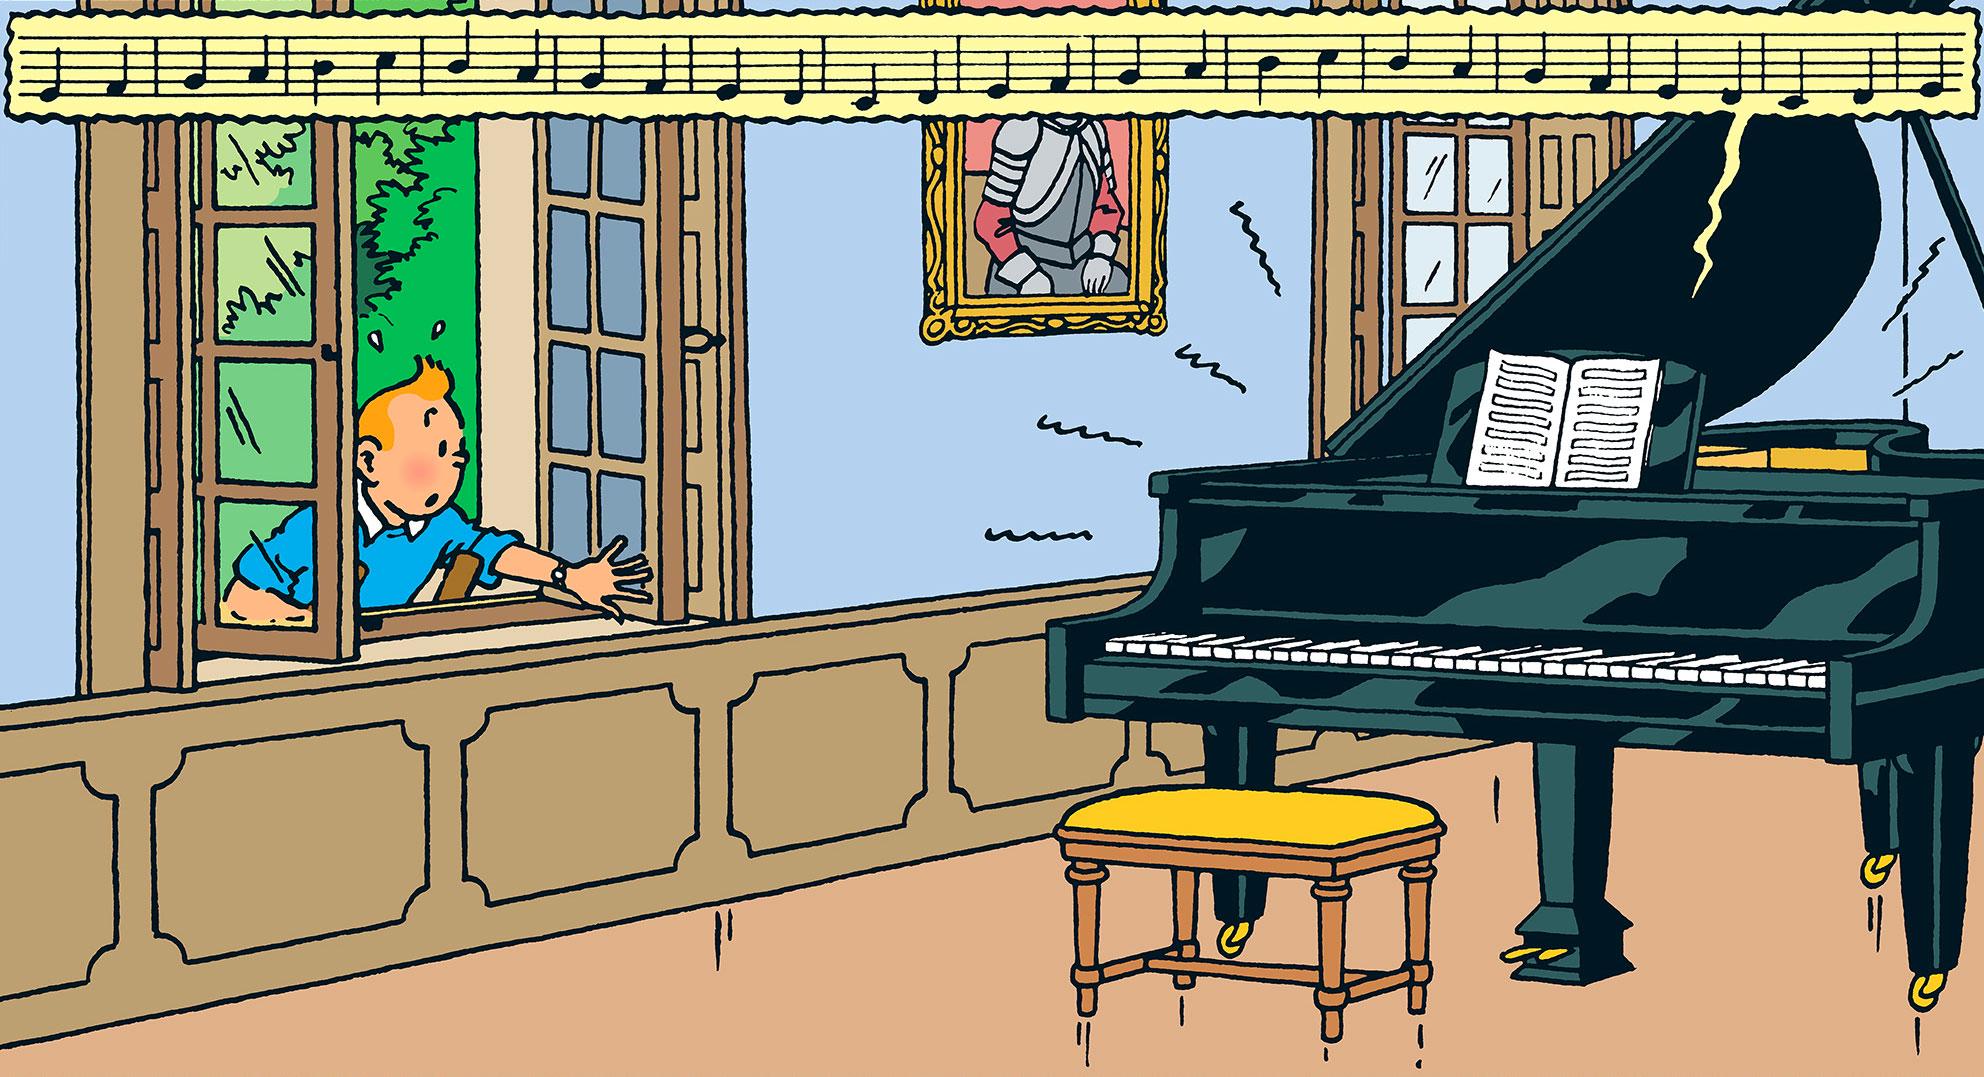 Les Bijoux de la Castafiore - Piano - Tintin